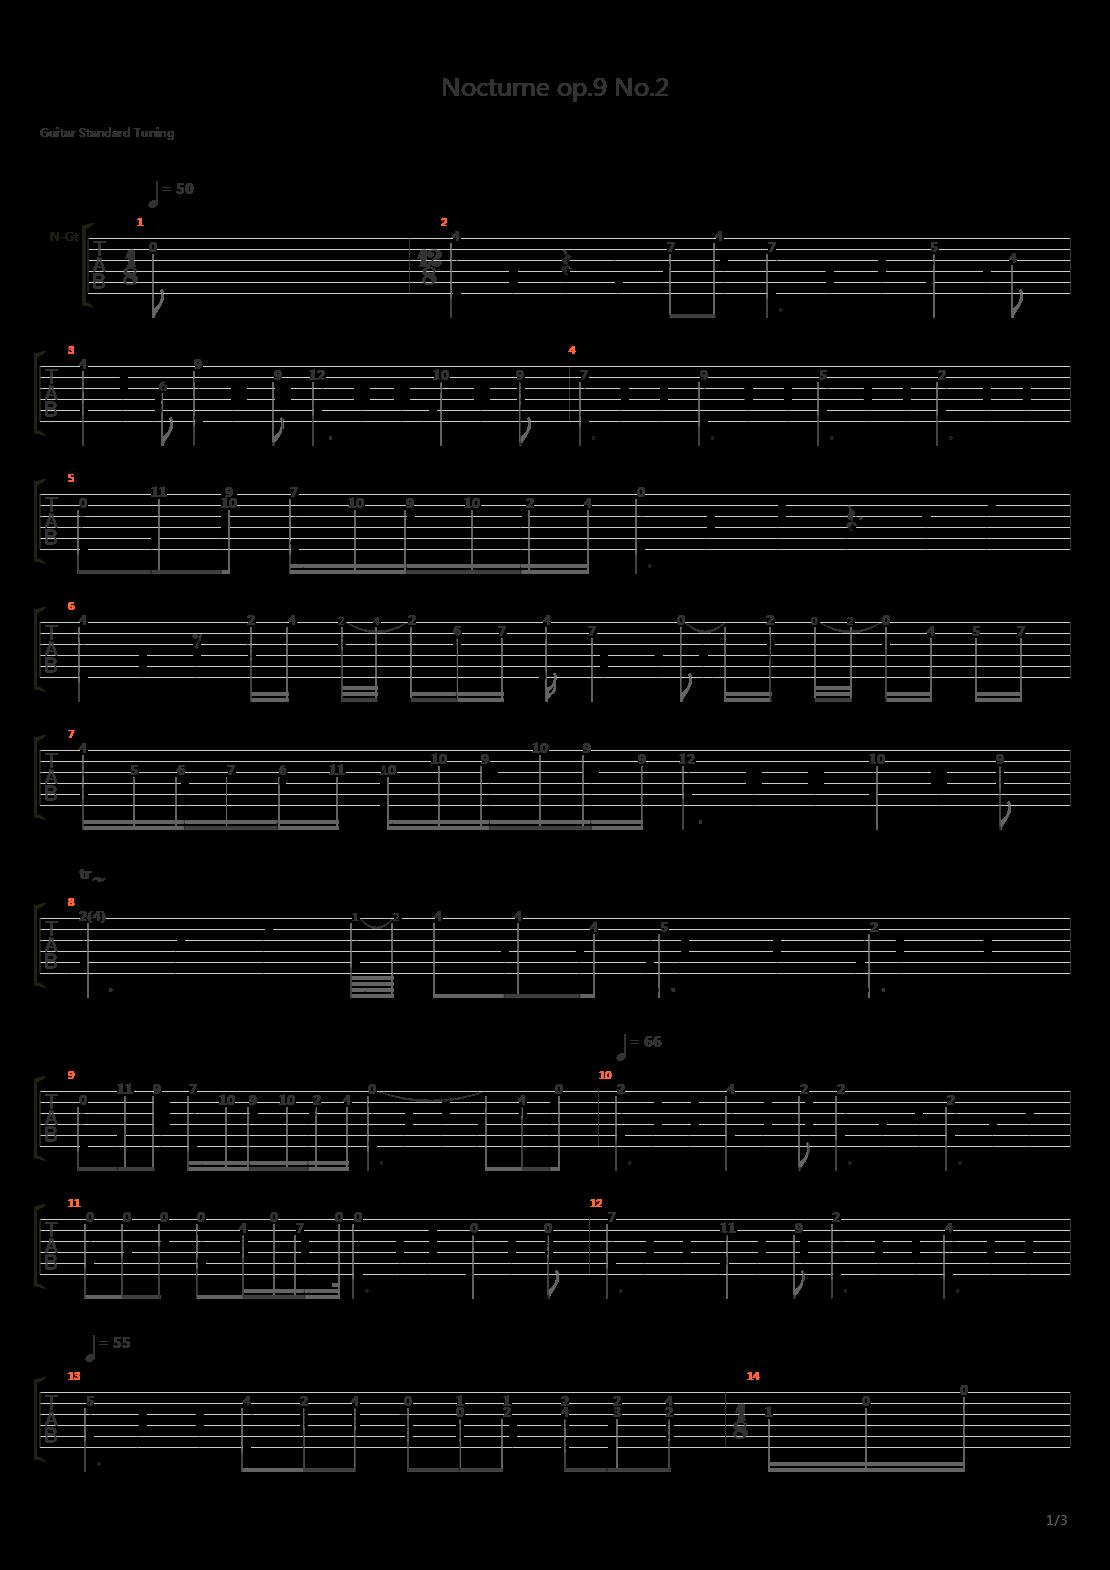 肖邦(Chopin)Nocturne Op 9 No 2吉他谱